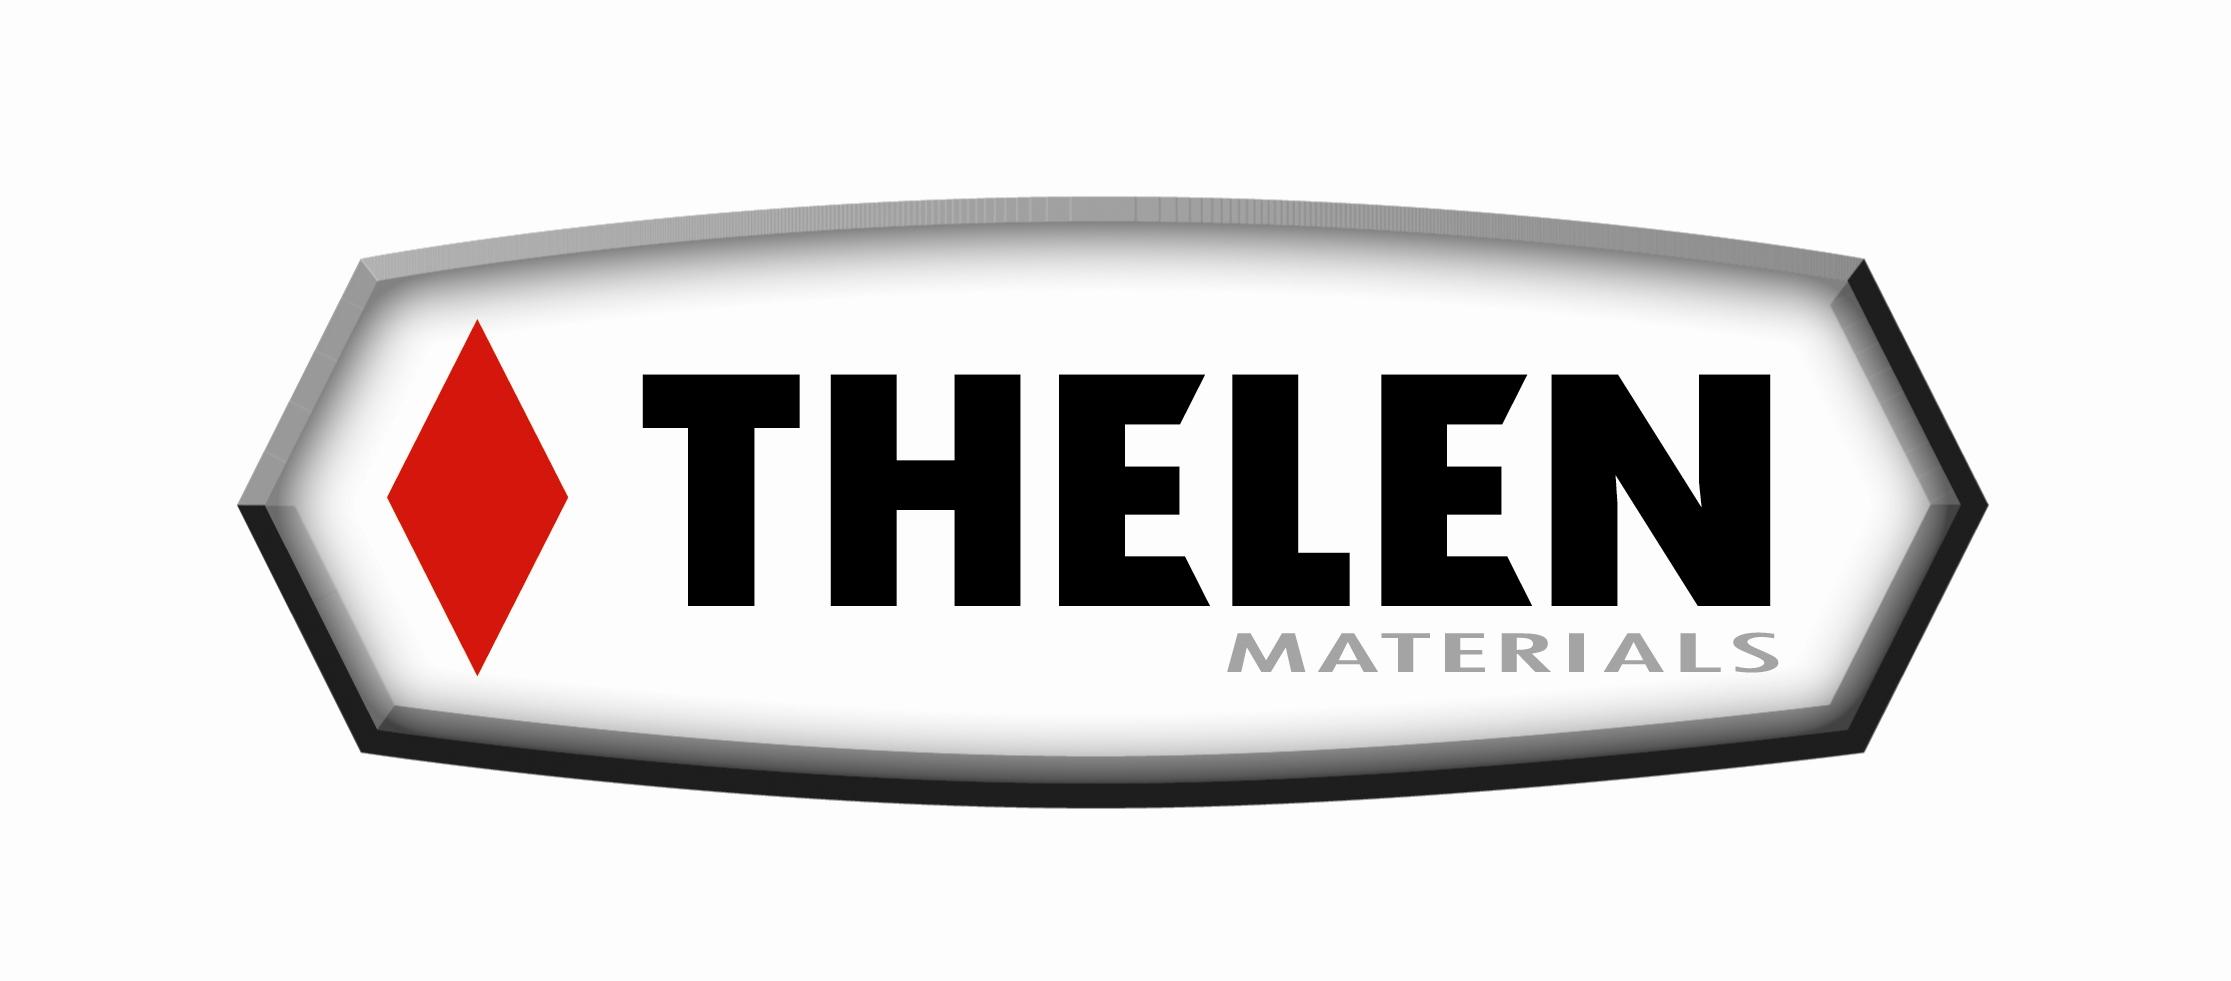 Thelen Materials Large Logo 3-30-07 (2).JPG